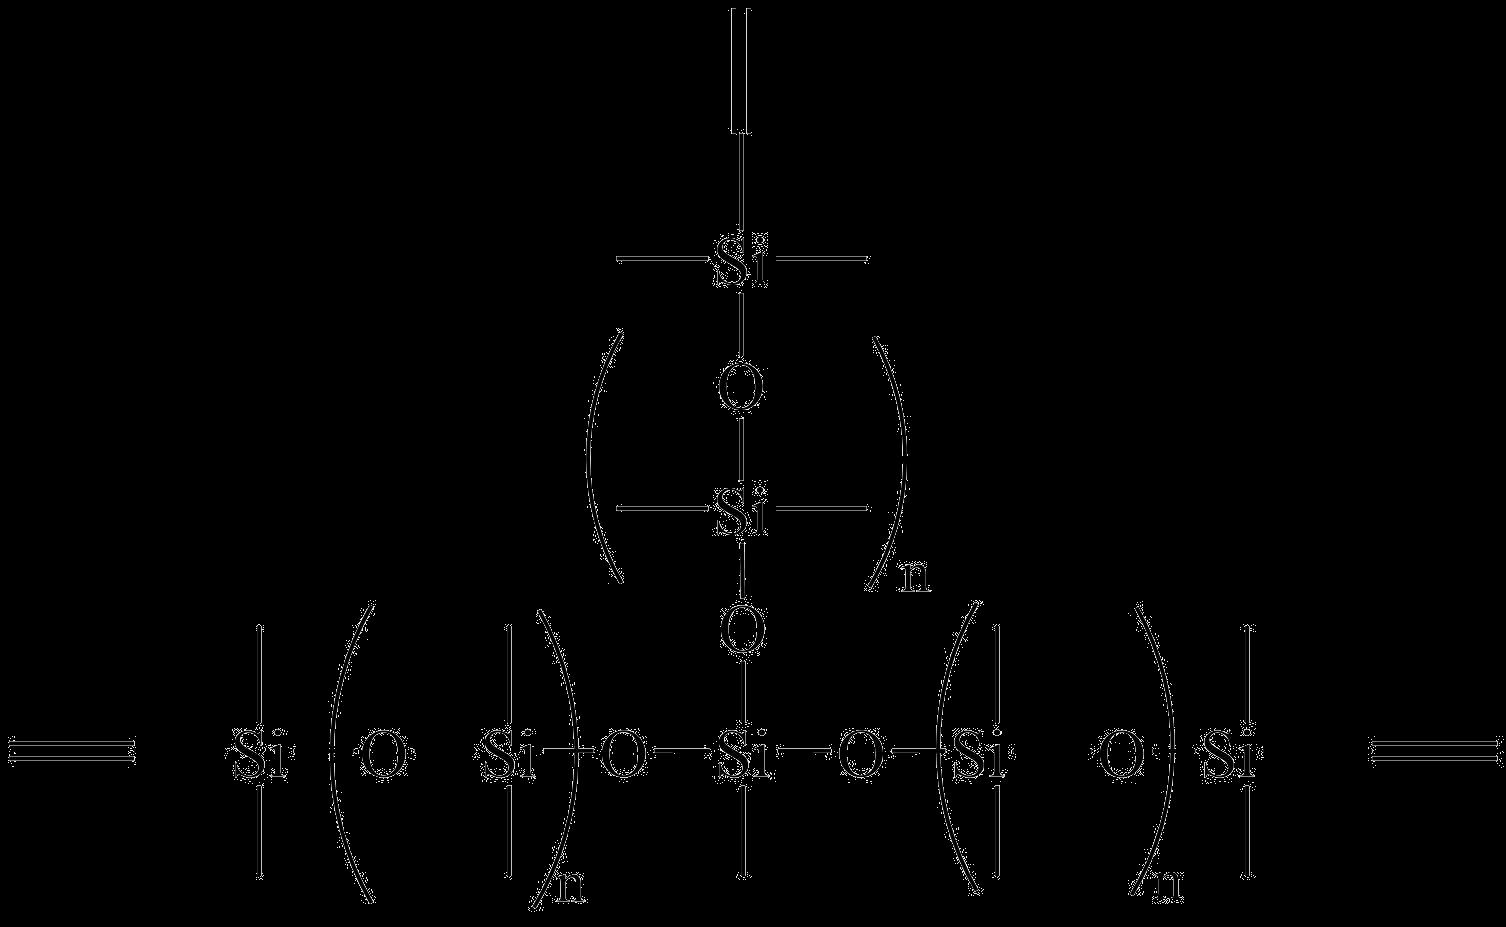 VINYL T-STRUCTURE POLYMER, 15-30 cSt